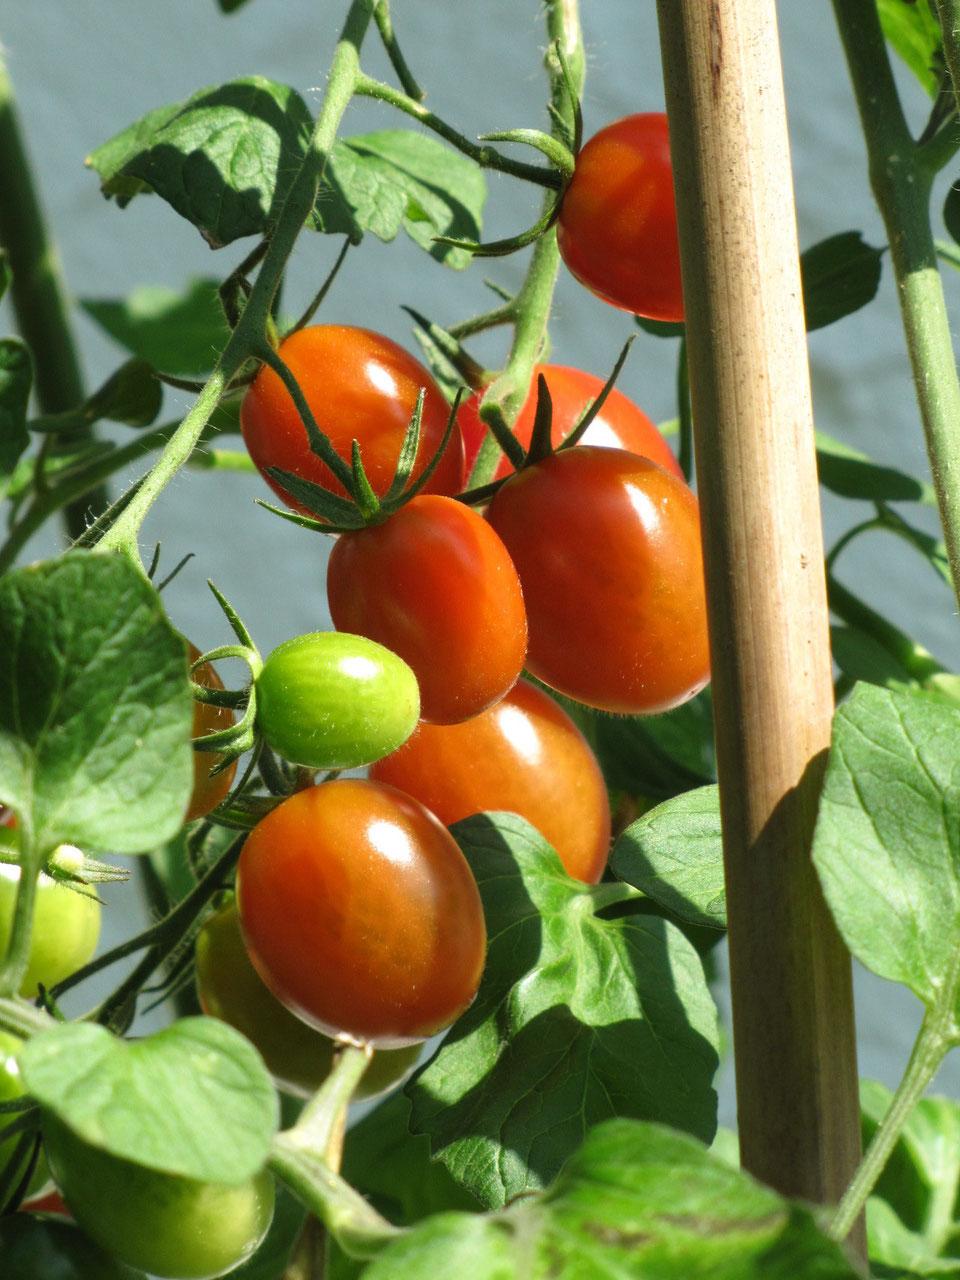 Tomate 'Rotes Taubenherz'